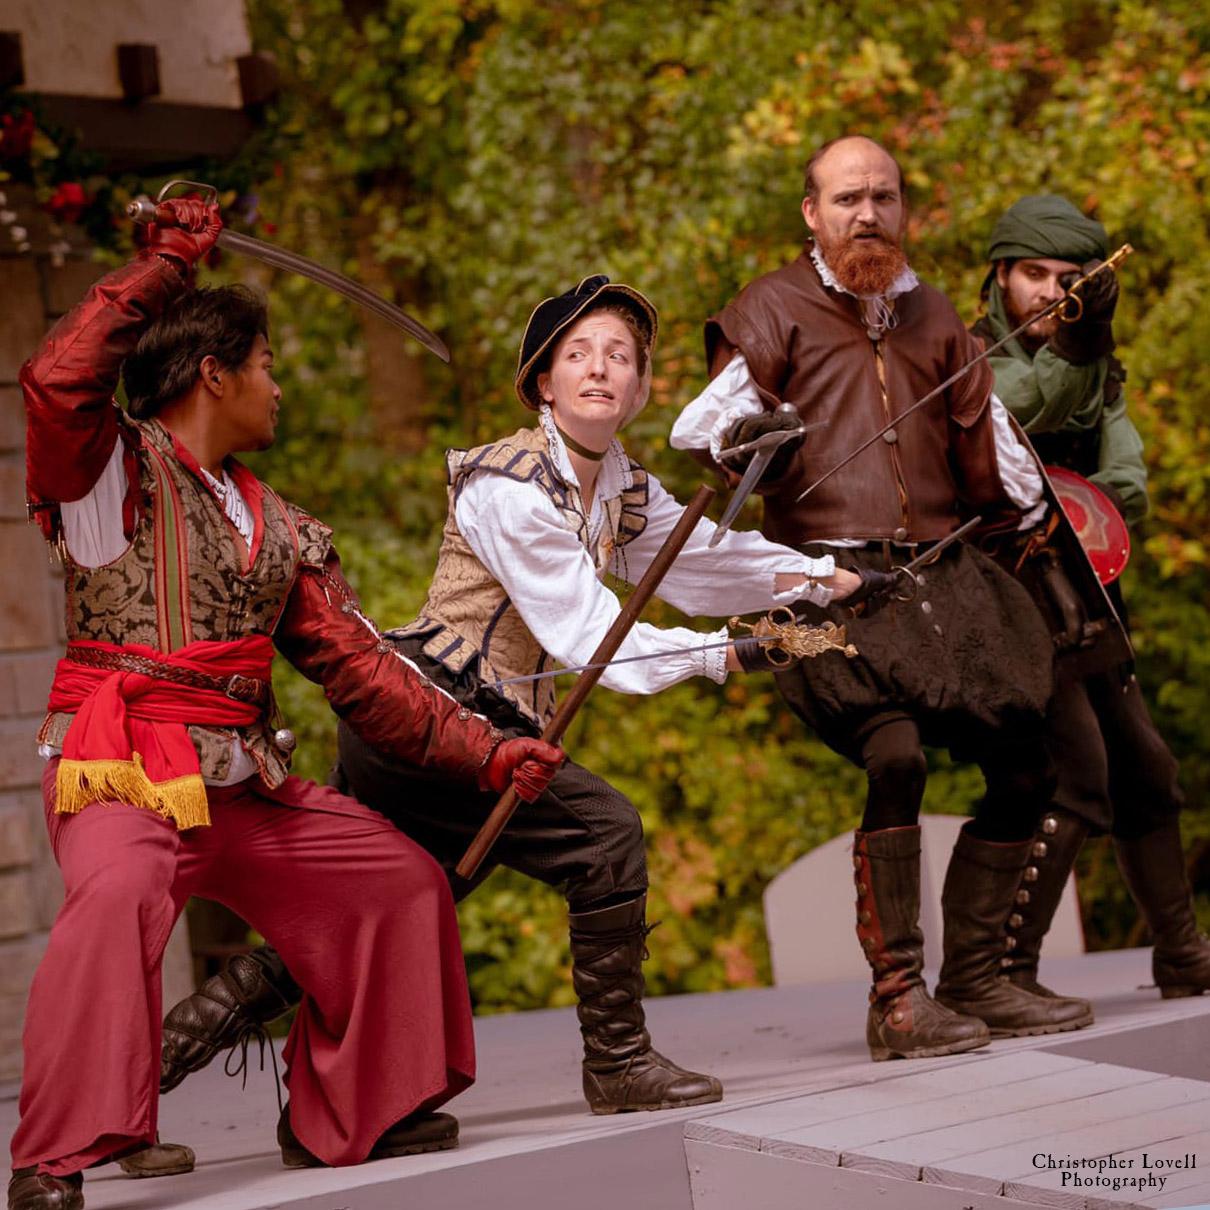 Entertainment: The Four Swords historical combat comedy